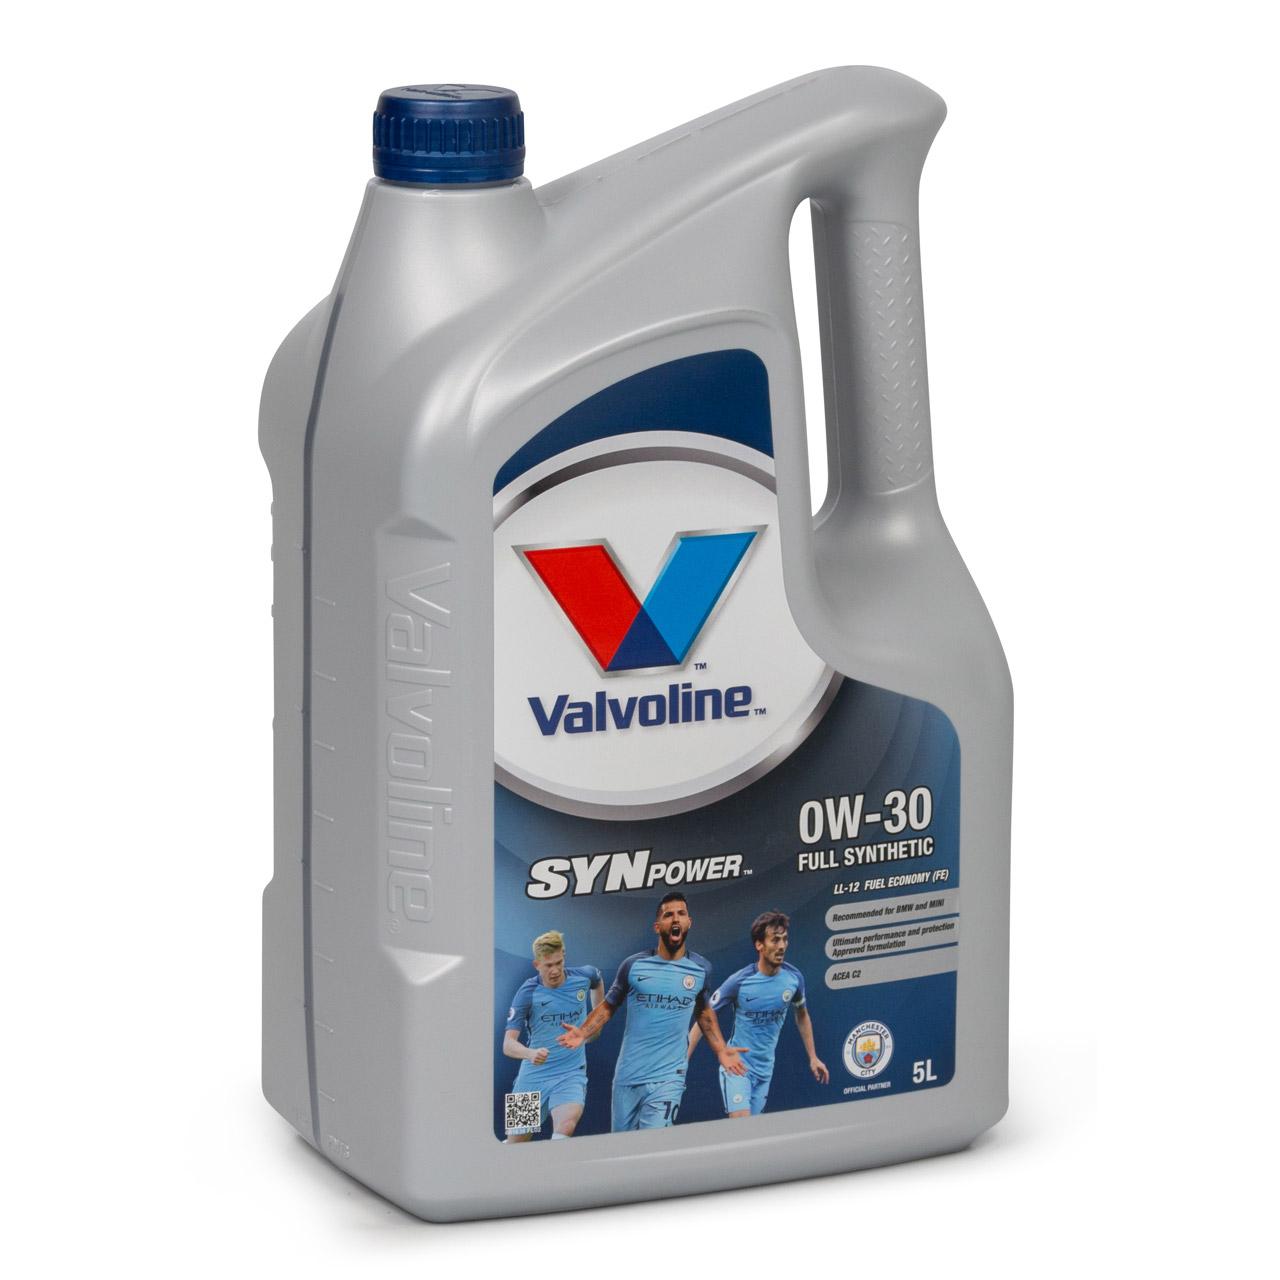 VALVOLINE Motoröl ÖL SYNPOWER LL-12 FE 0W30 für BMW Longlife-12 FE - 5L 5 Liter